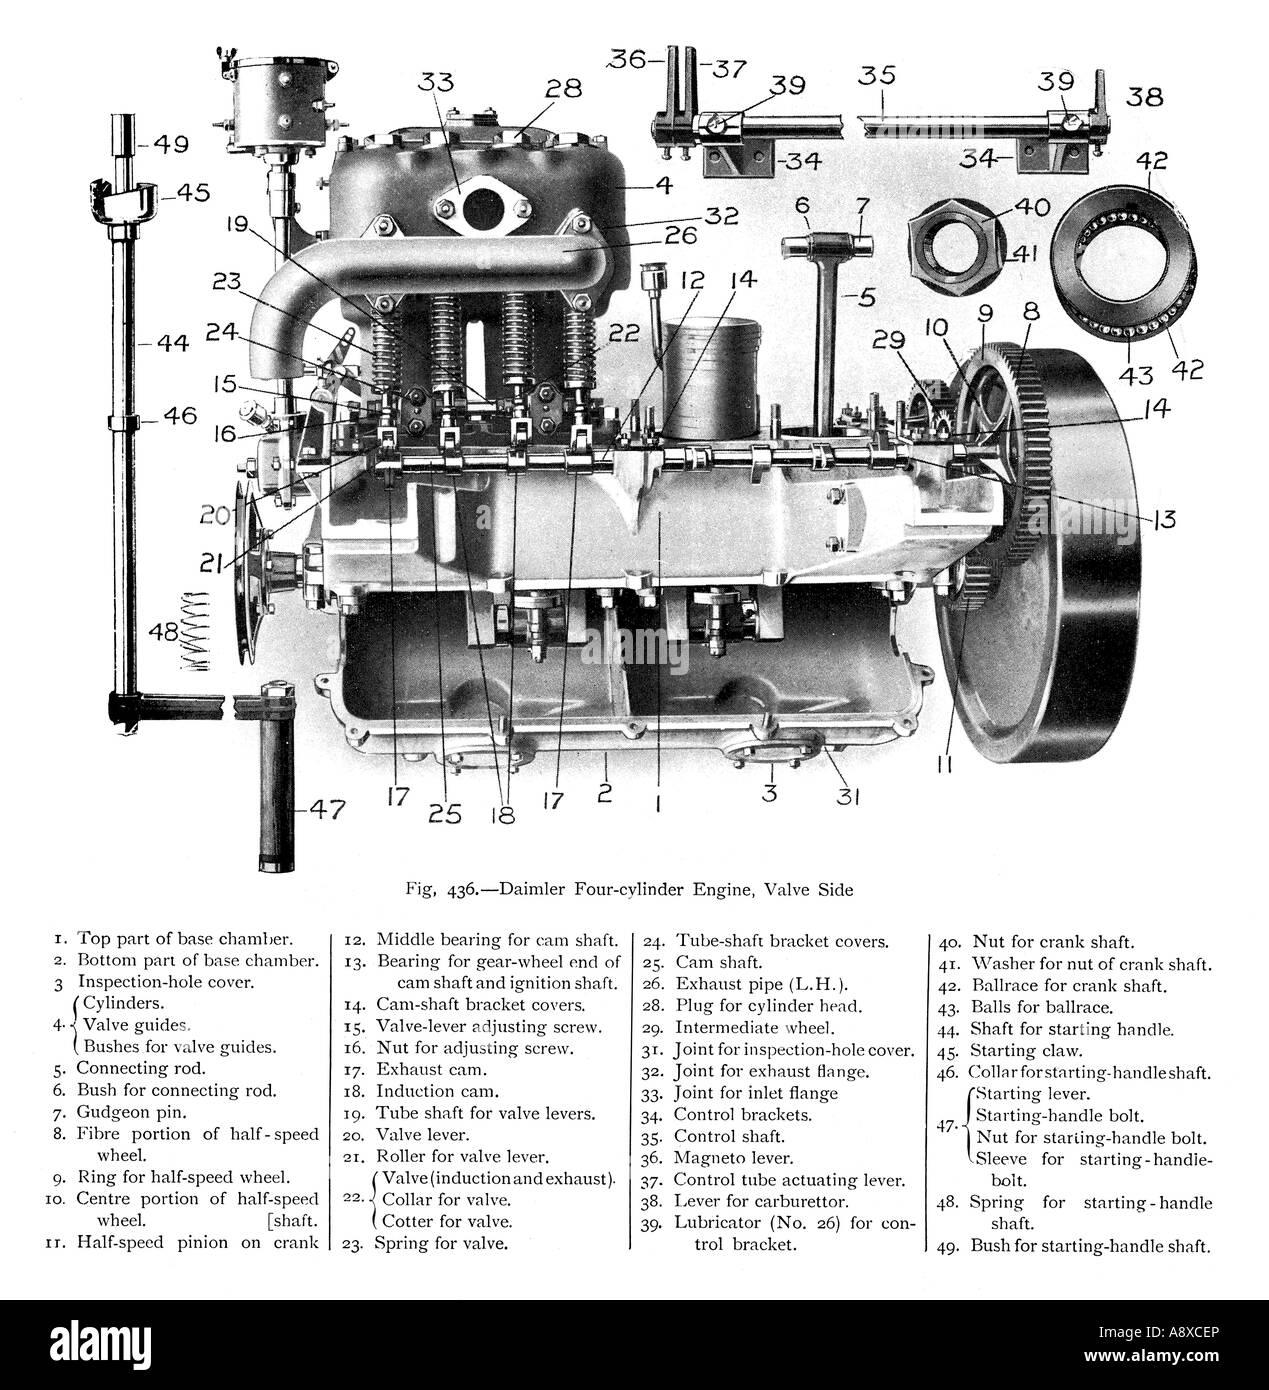 4 Cylinder Car Engine Diagram Wiring Third Level Jeep Cherokee 0l Blog 6